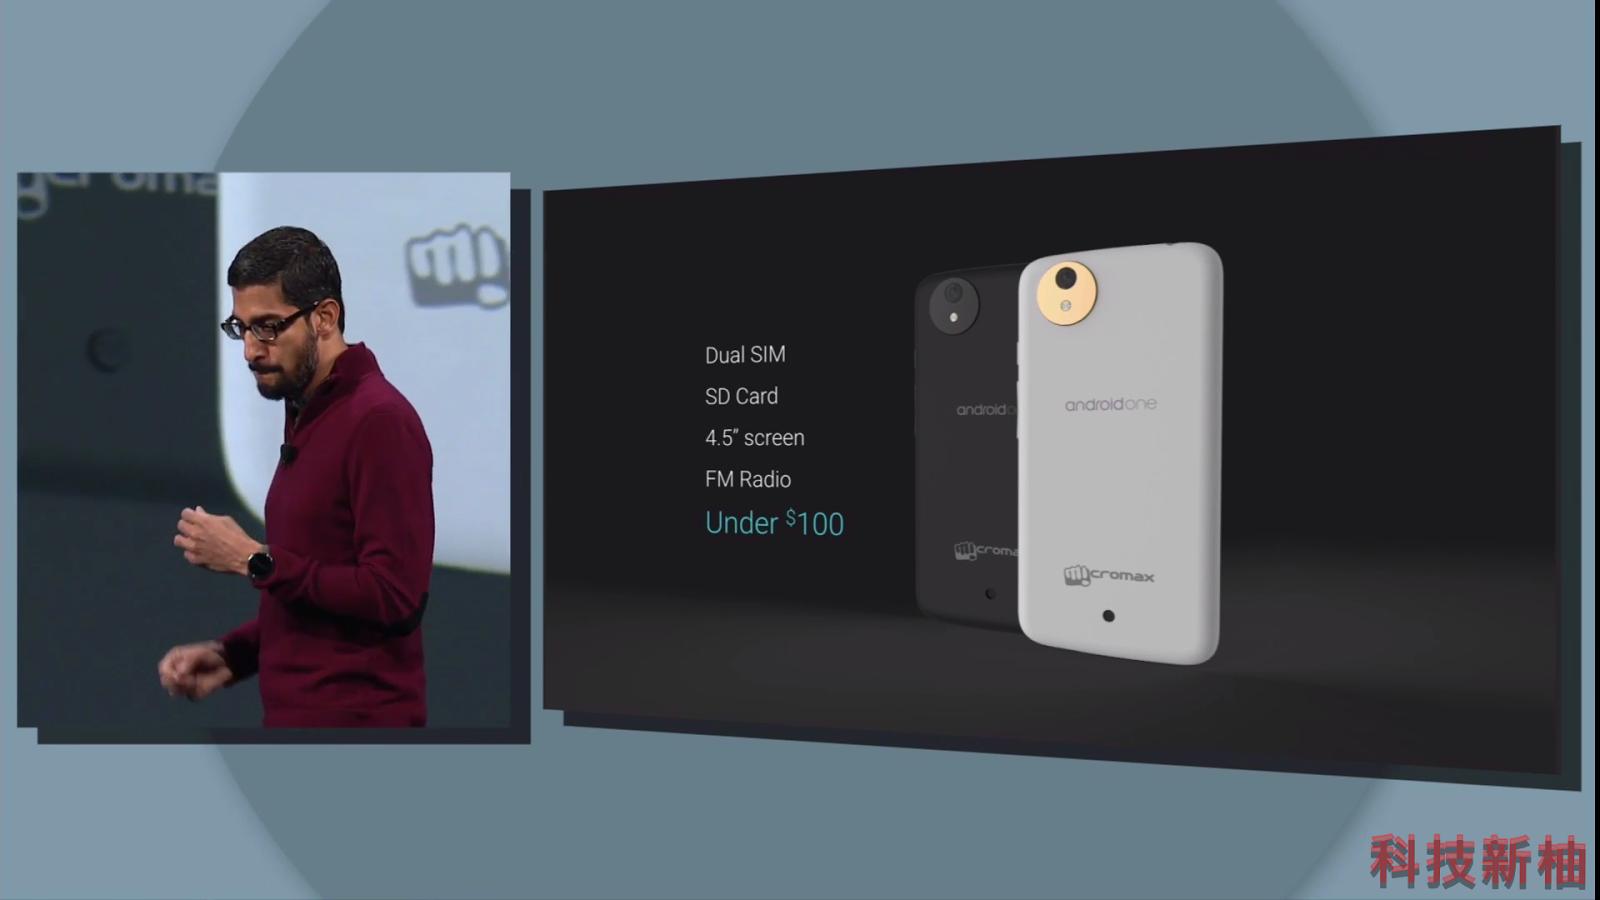 [Google I/O 2014] Google 針對新興市場發表 Android One 計畫